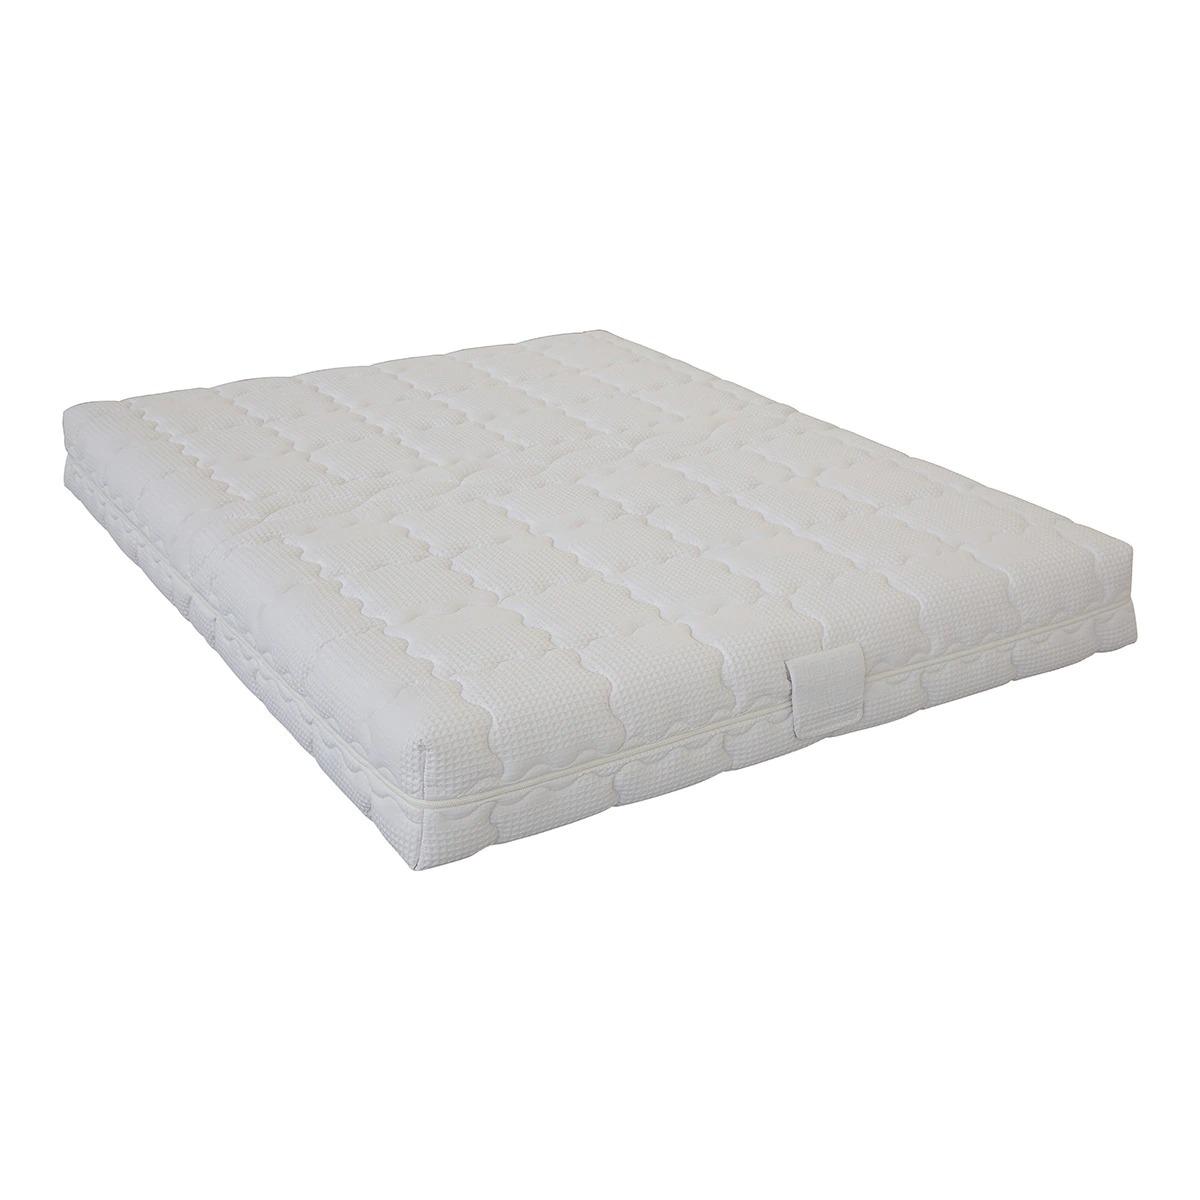 DINOC Physiotec and Physiofresh Format-N Dinoc foam mattress